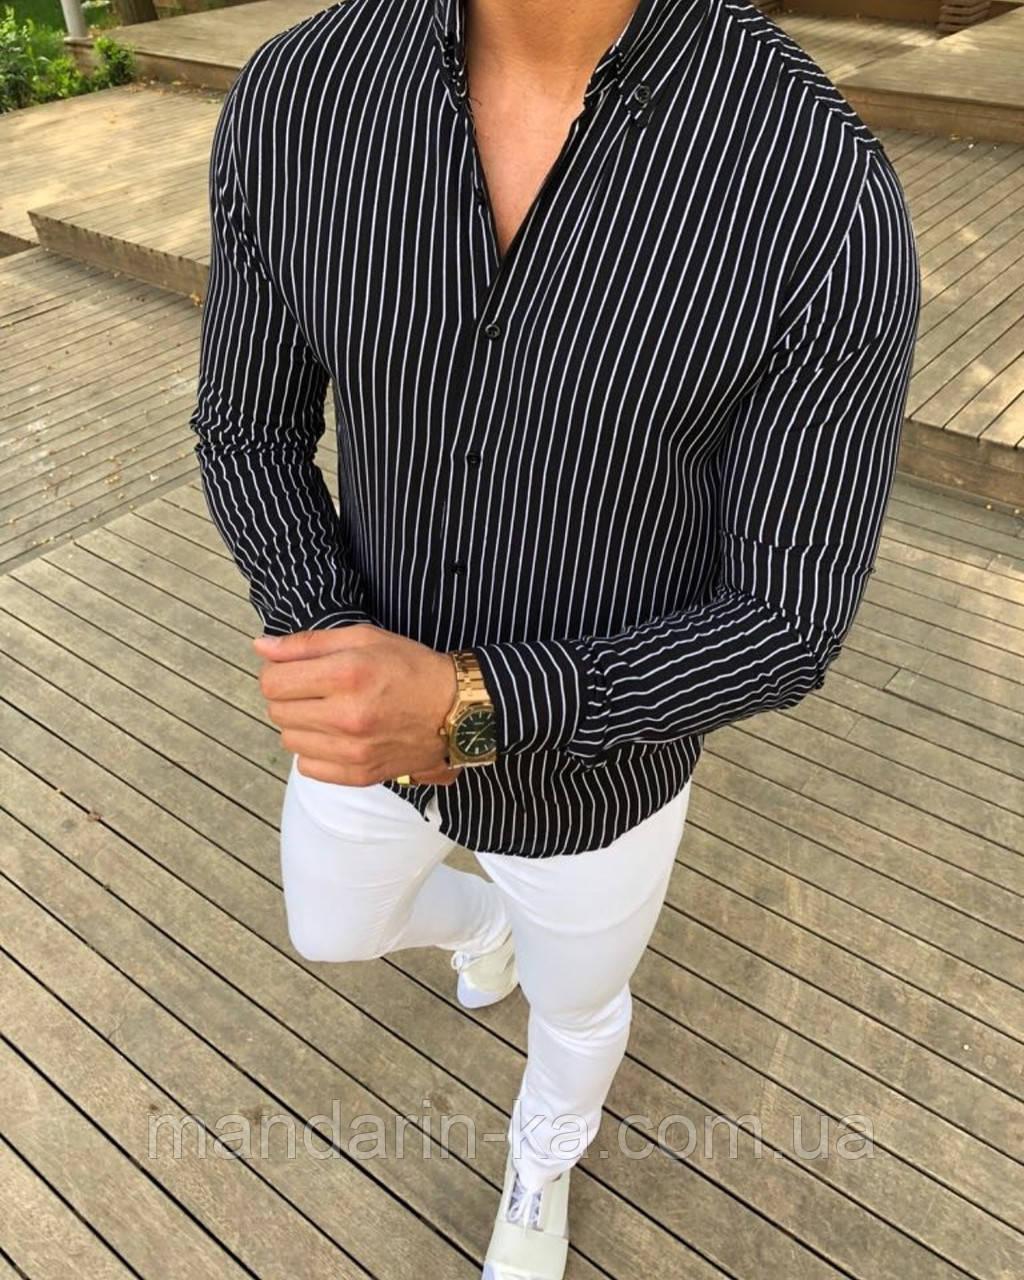 f7f036c4f4c Мужская рубашка Slim Fit в полоску - Mandarin-ka в Киеве